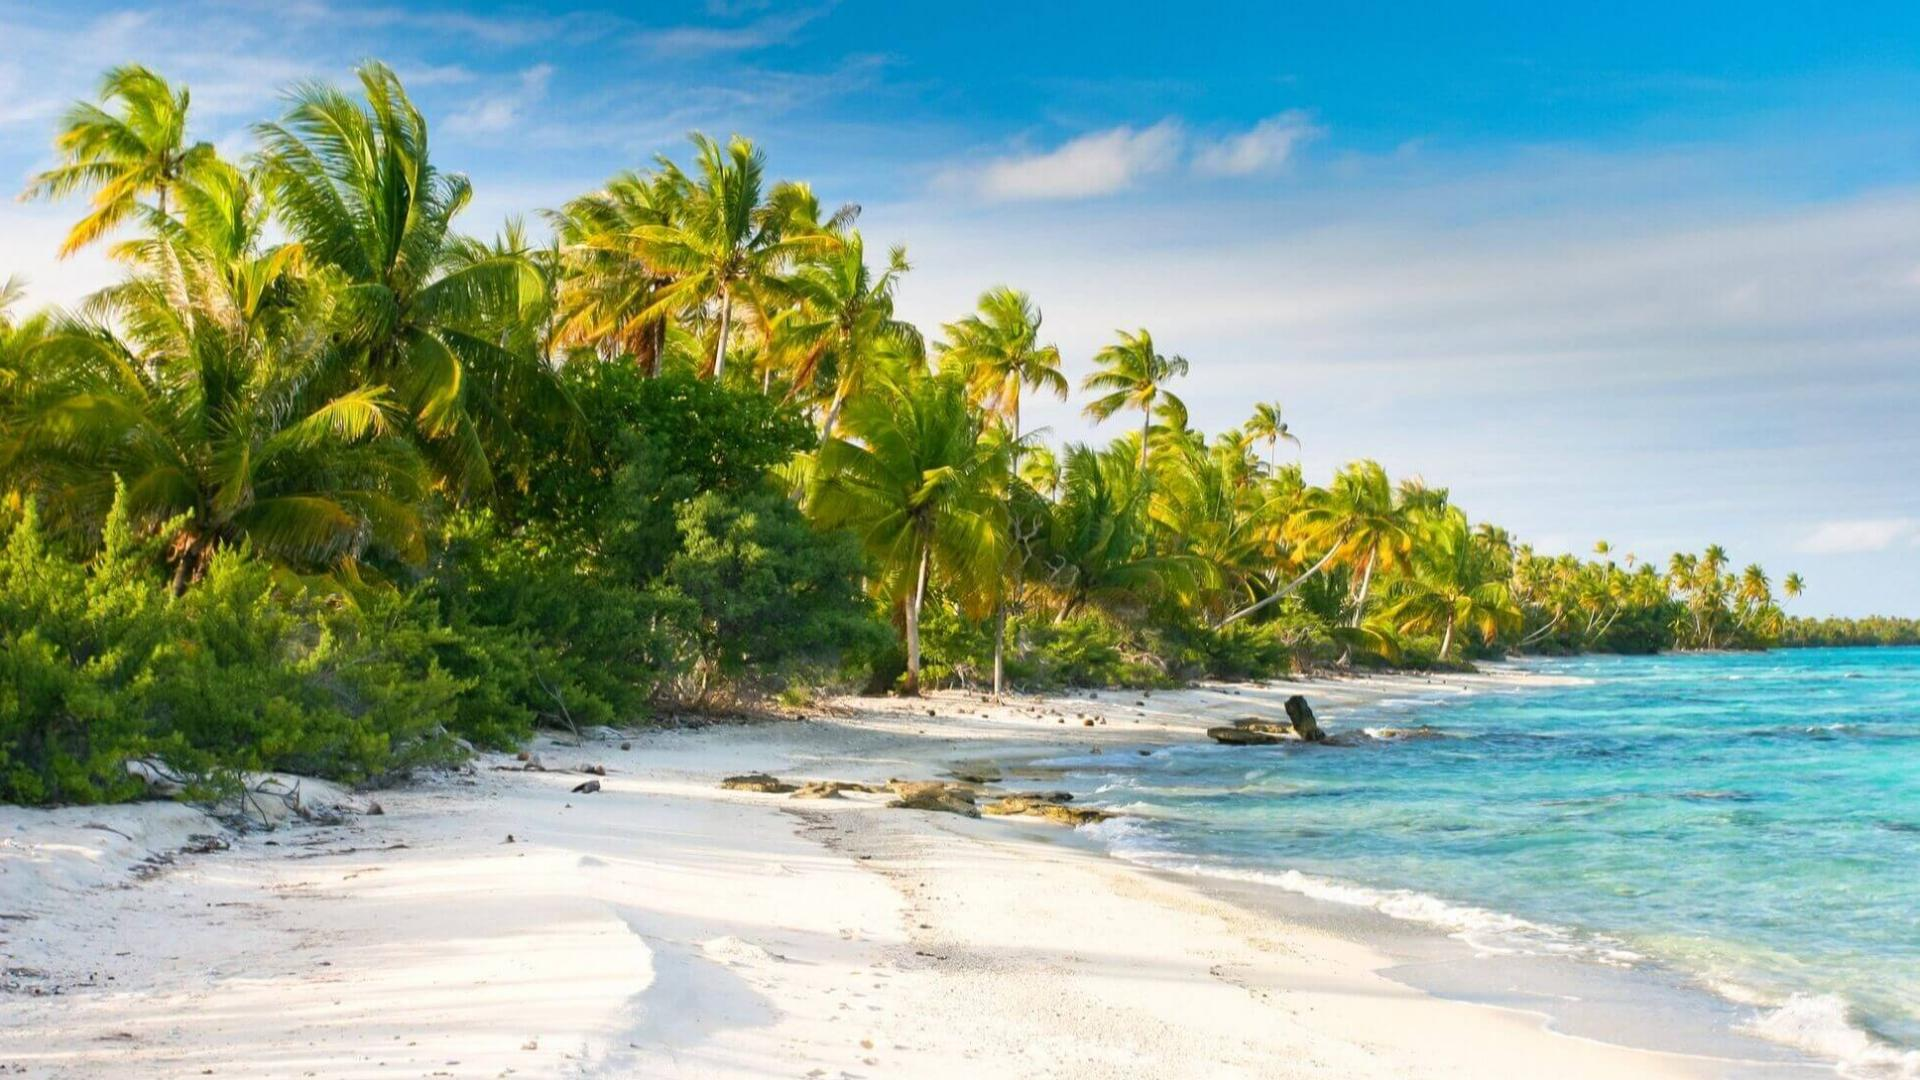 Tropiniai paplūdimiai Fakarava atole